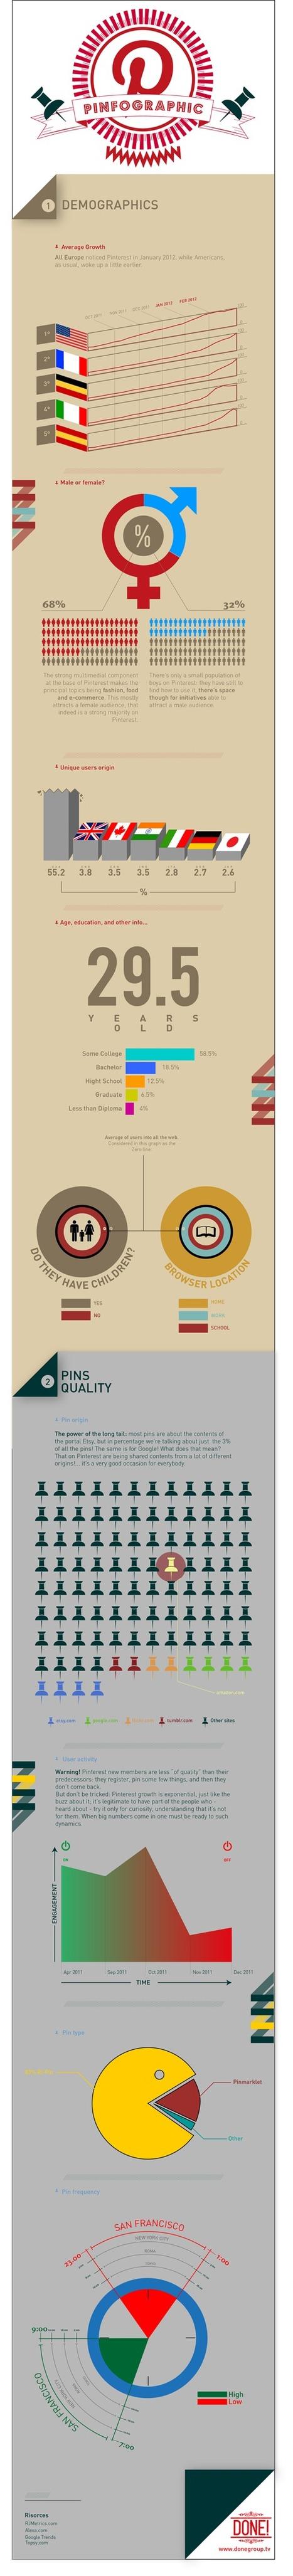 Infografica: Chi è che usa Pinterest? | guida pinterest | Scoop.it